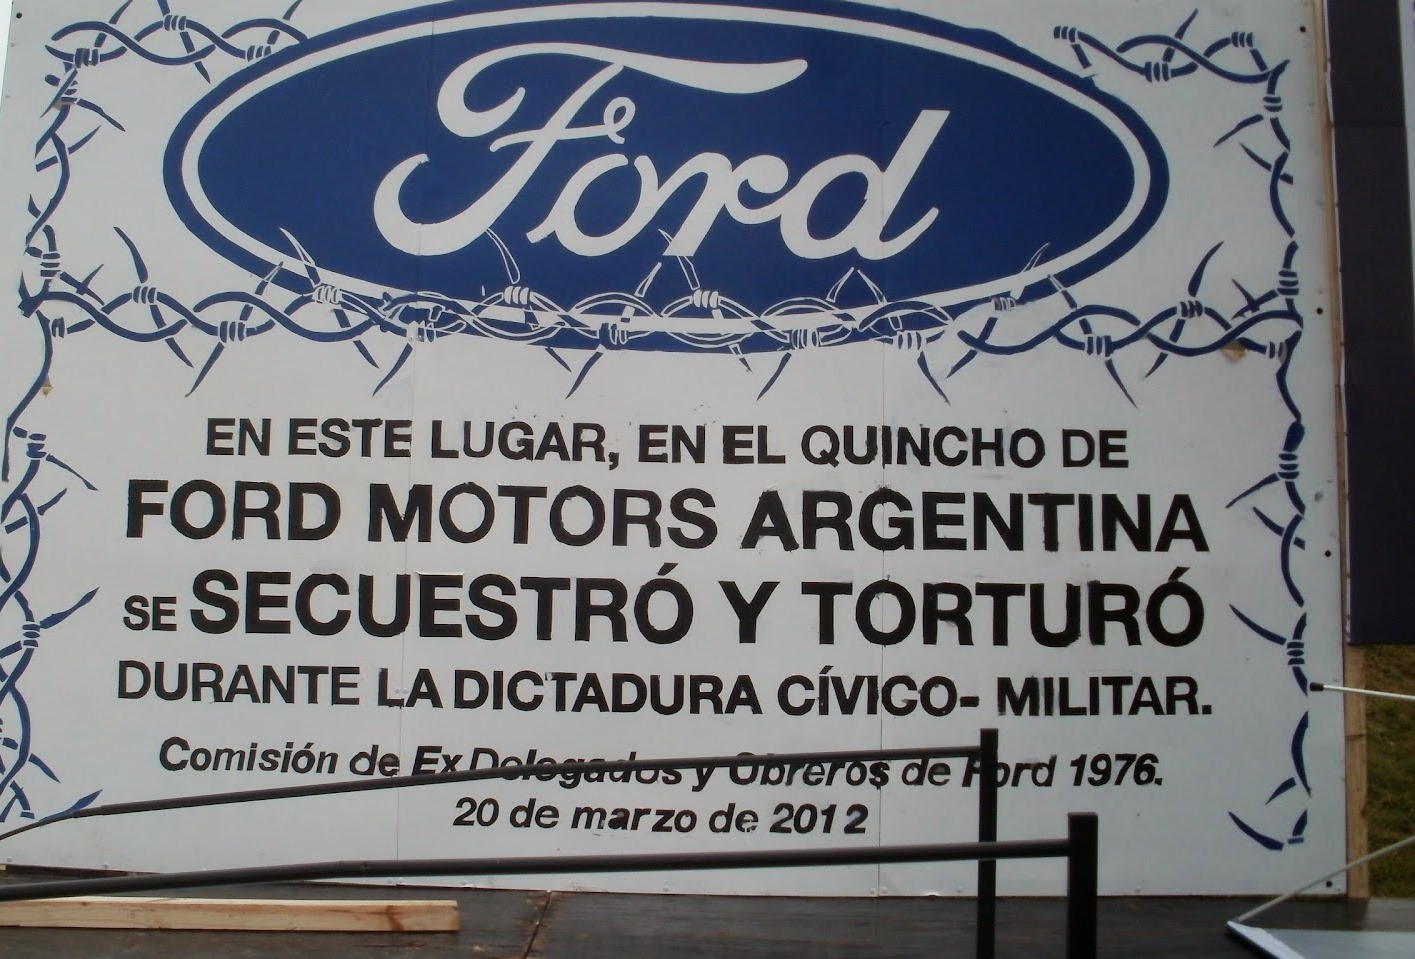 placa-desap-ford-2012-002